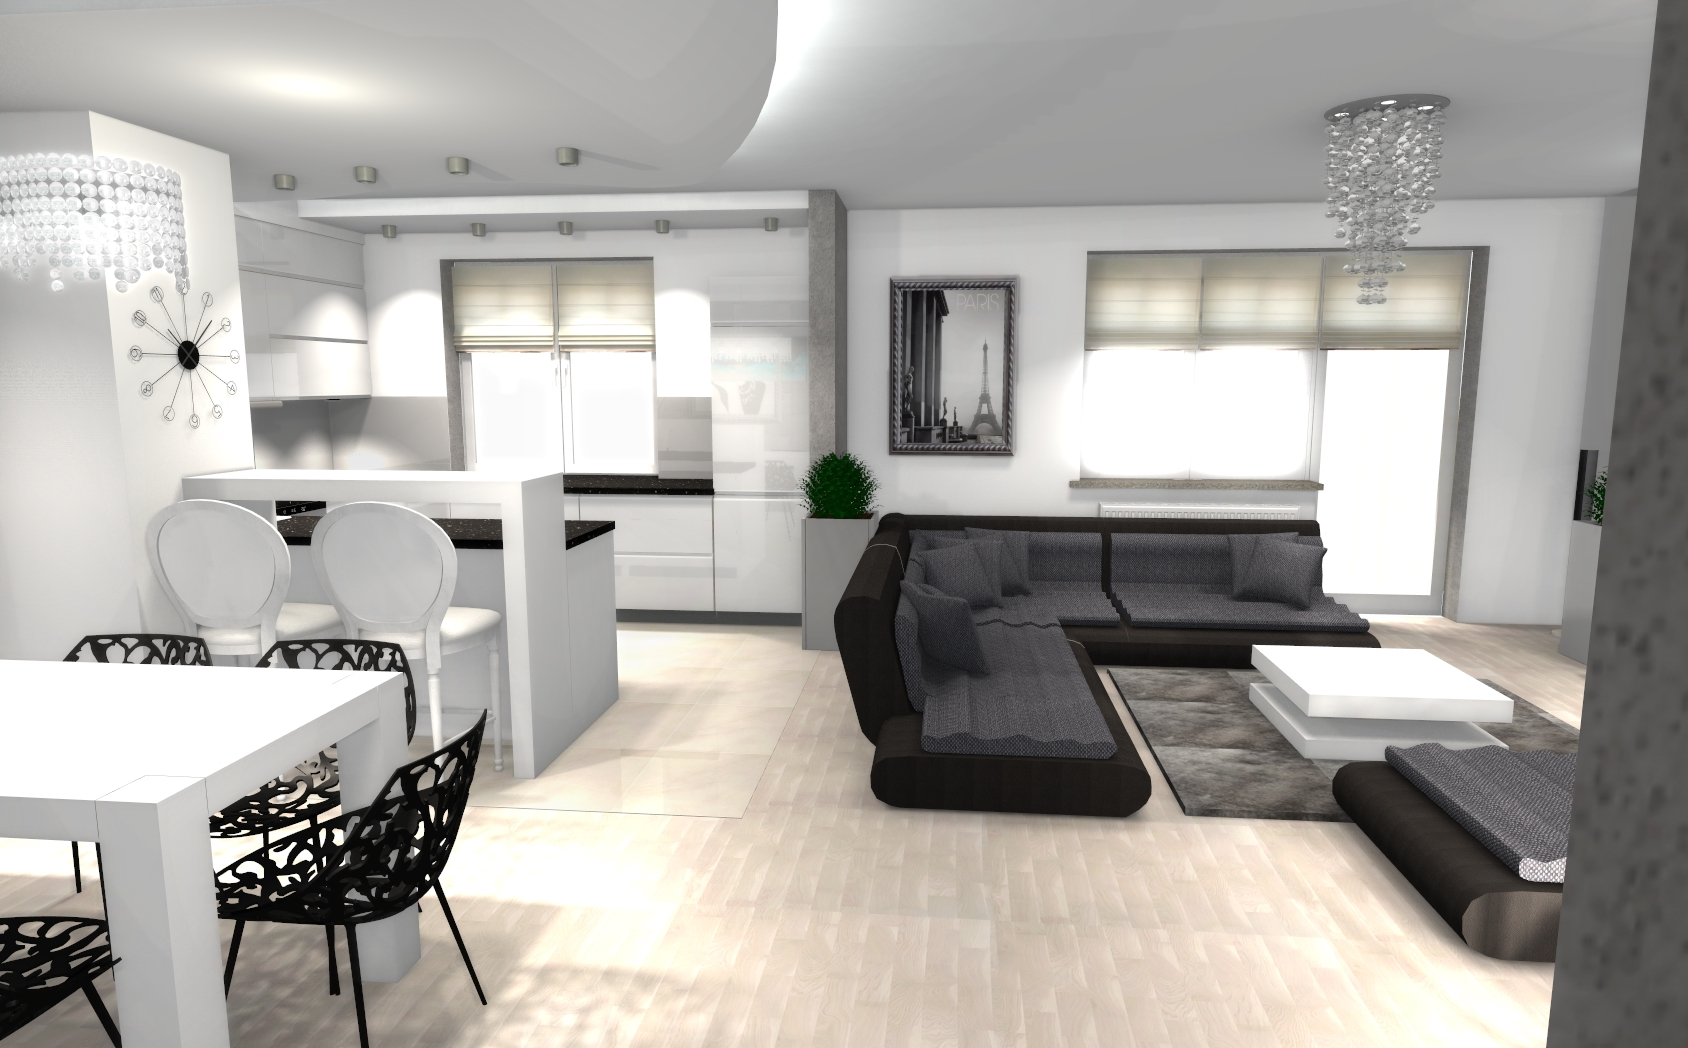 artehaus projektowanie wn trz na odleg os online. Black Bedroom Furniture Sets. Home Design Ideas